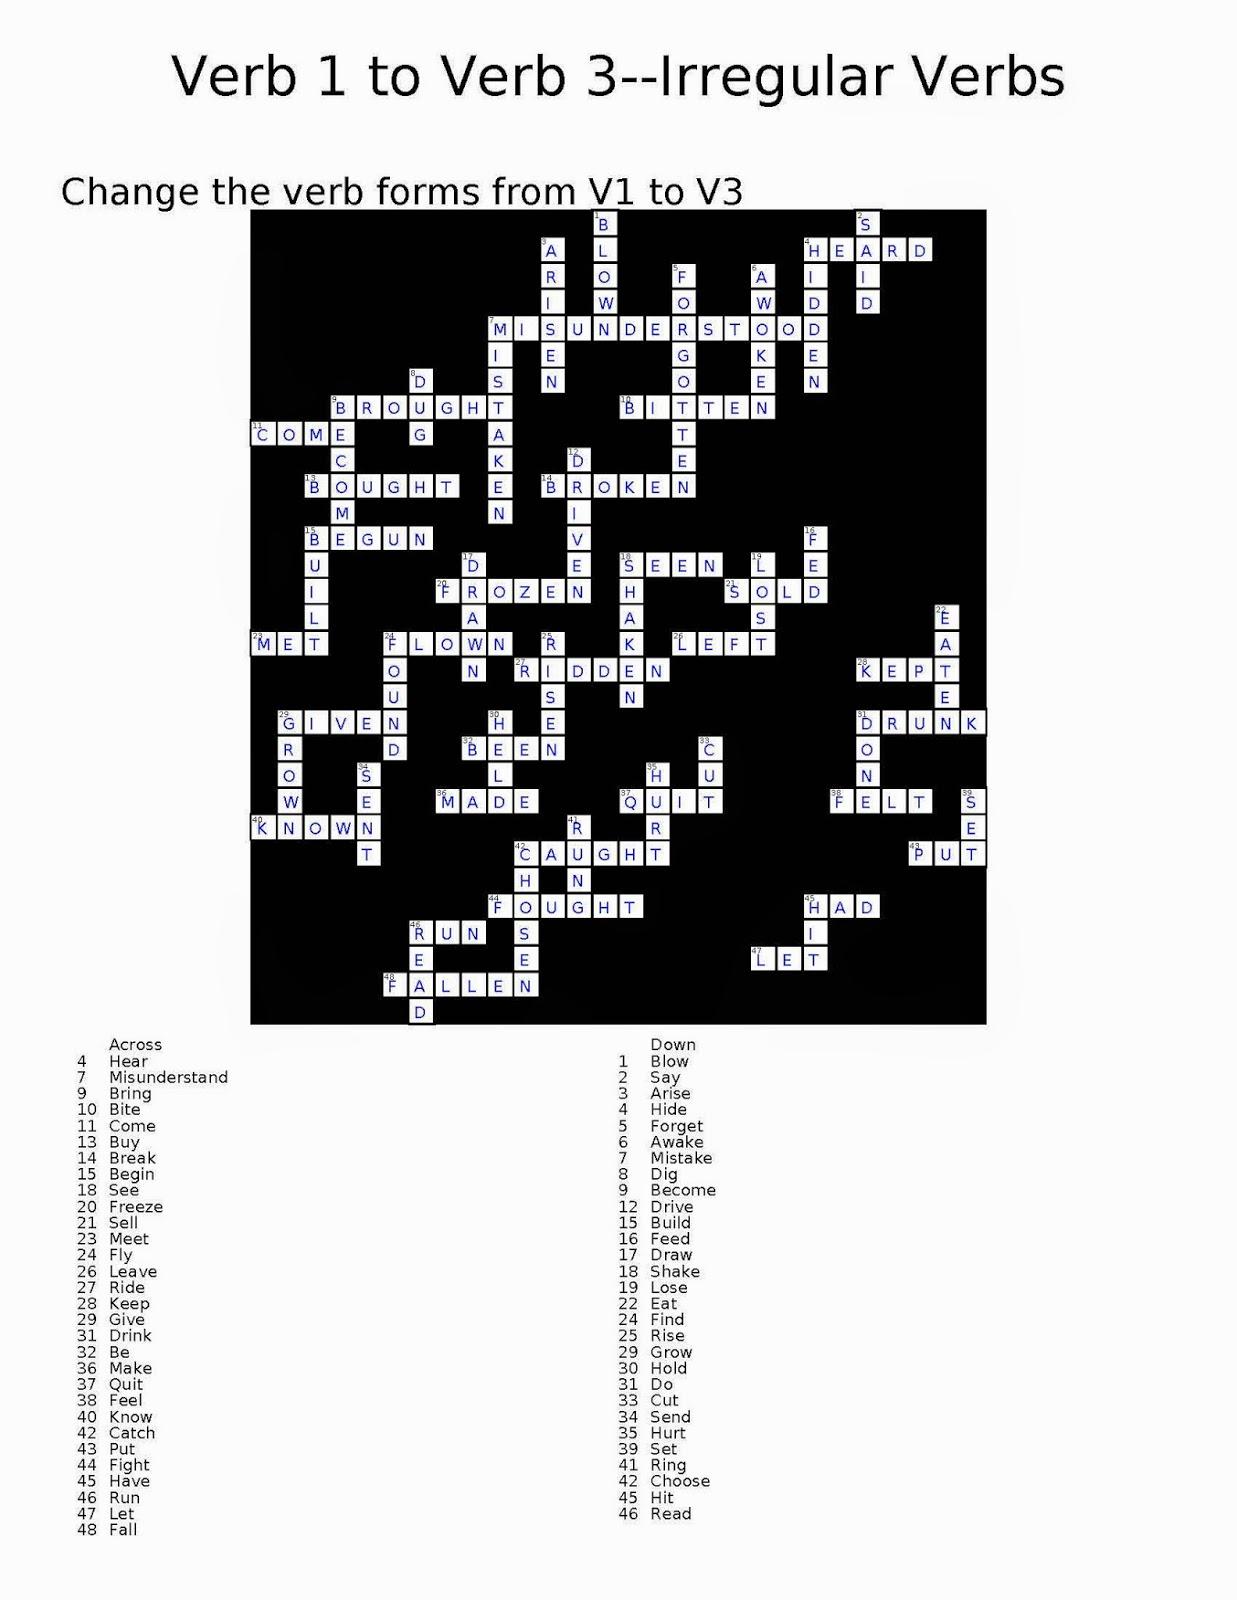 Random Book And Movie Reviews Verb 1 To Verb 3 Crossword Irregular Verbs